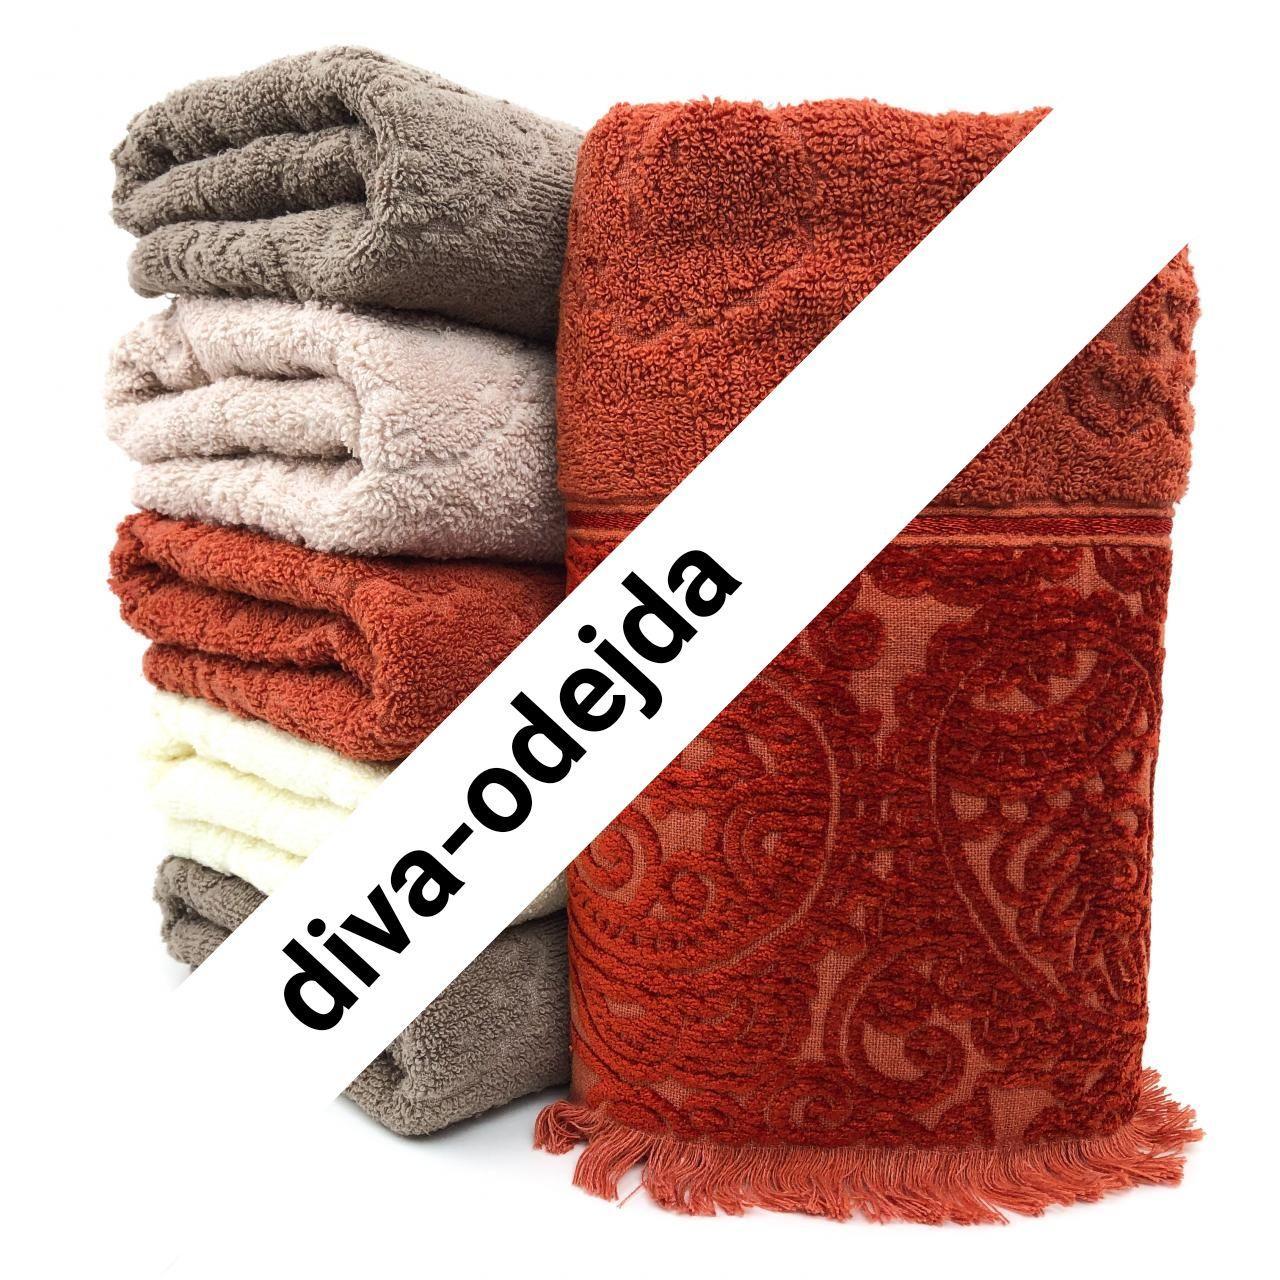 Банное полотенце с бахрамой.Размер:1,4 x 0,7